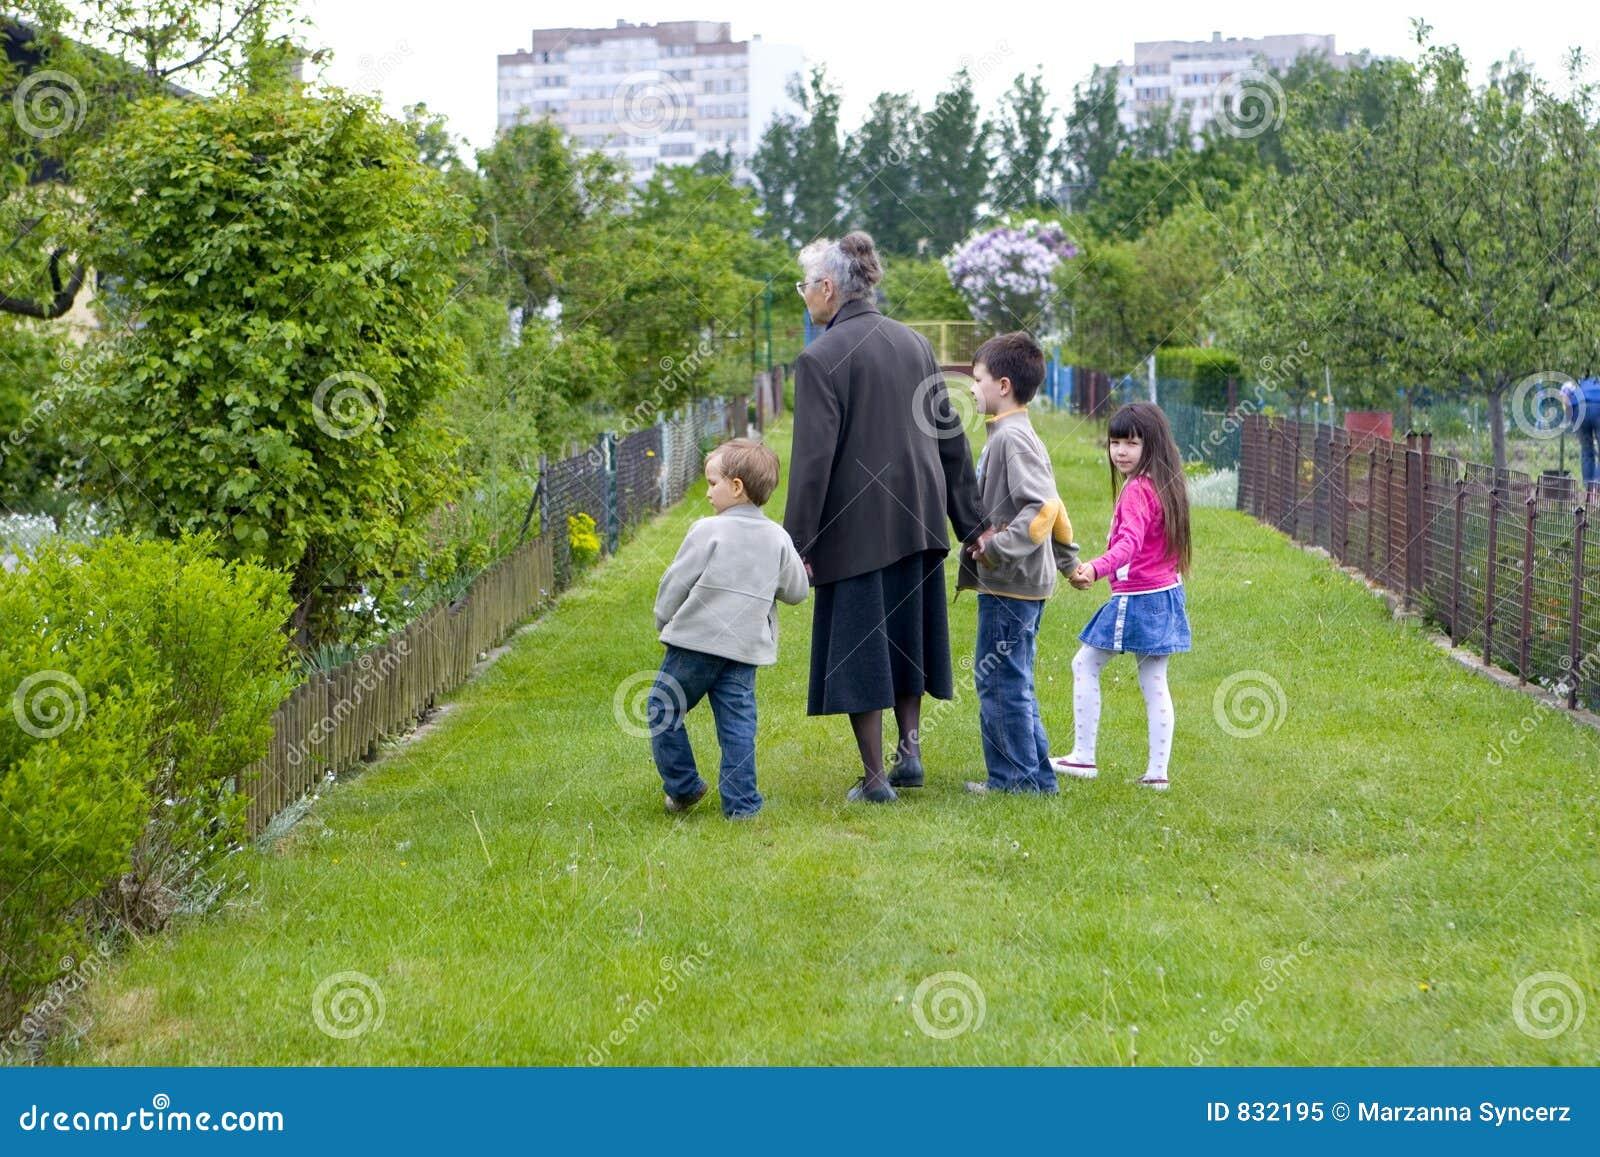 Grandma with children